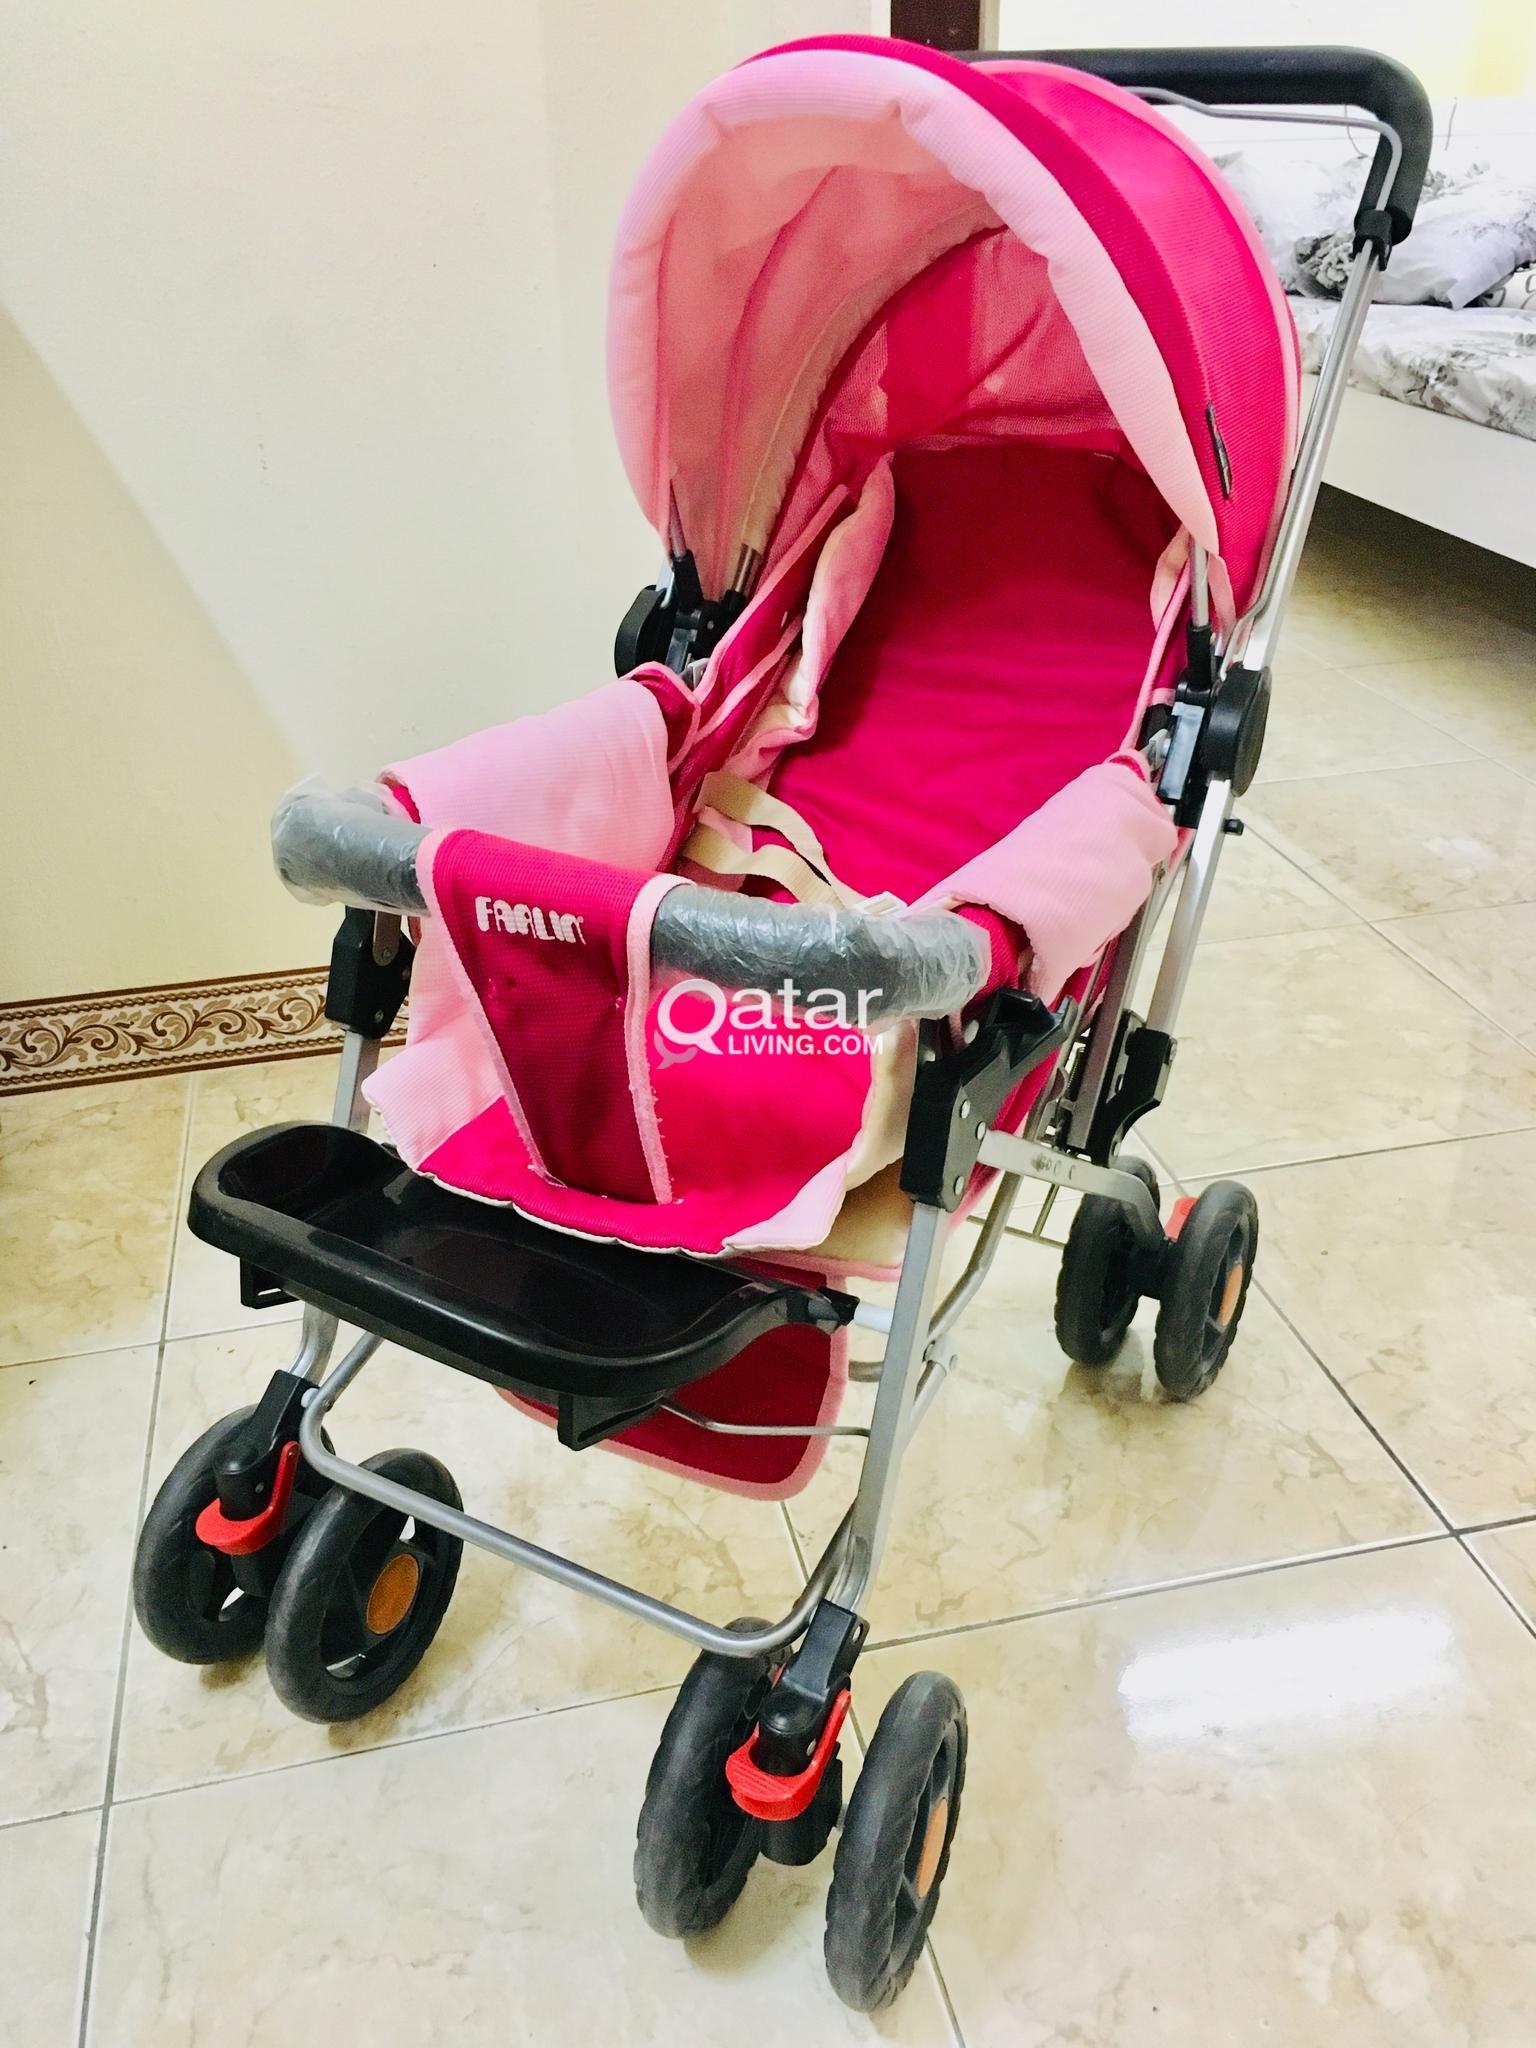 Farlin Baby Stroller for newborn   Qatar Living